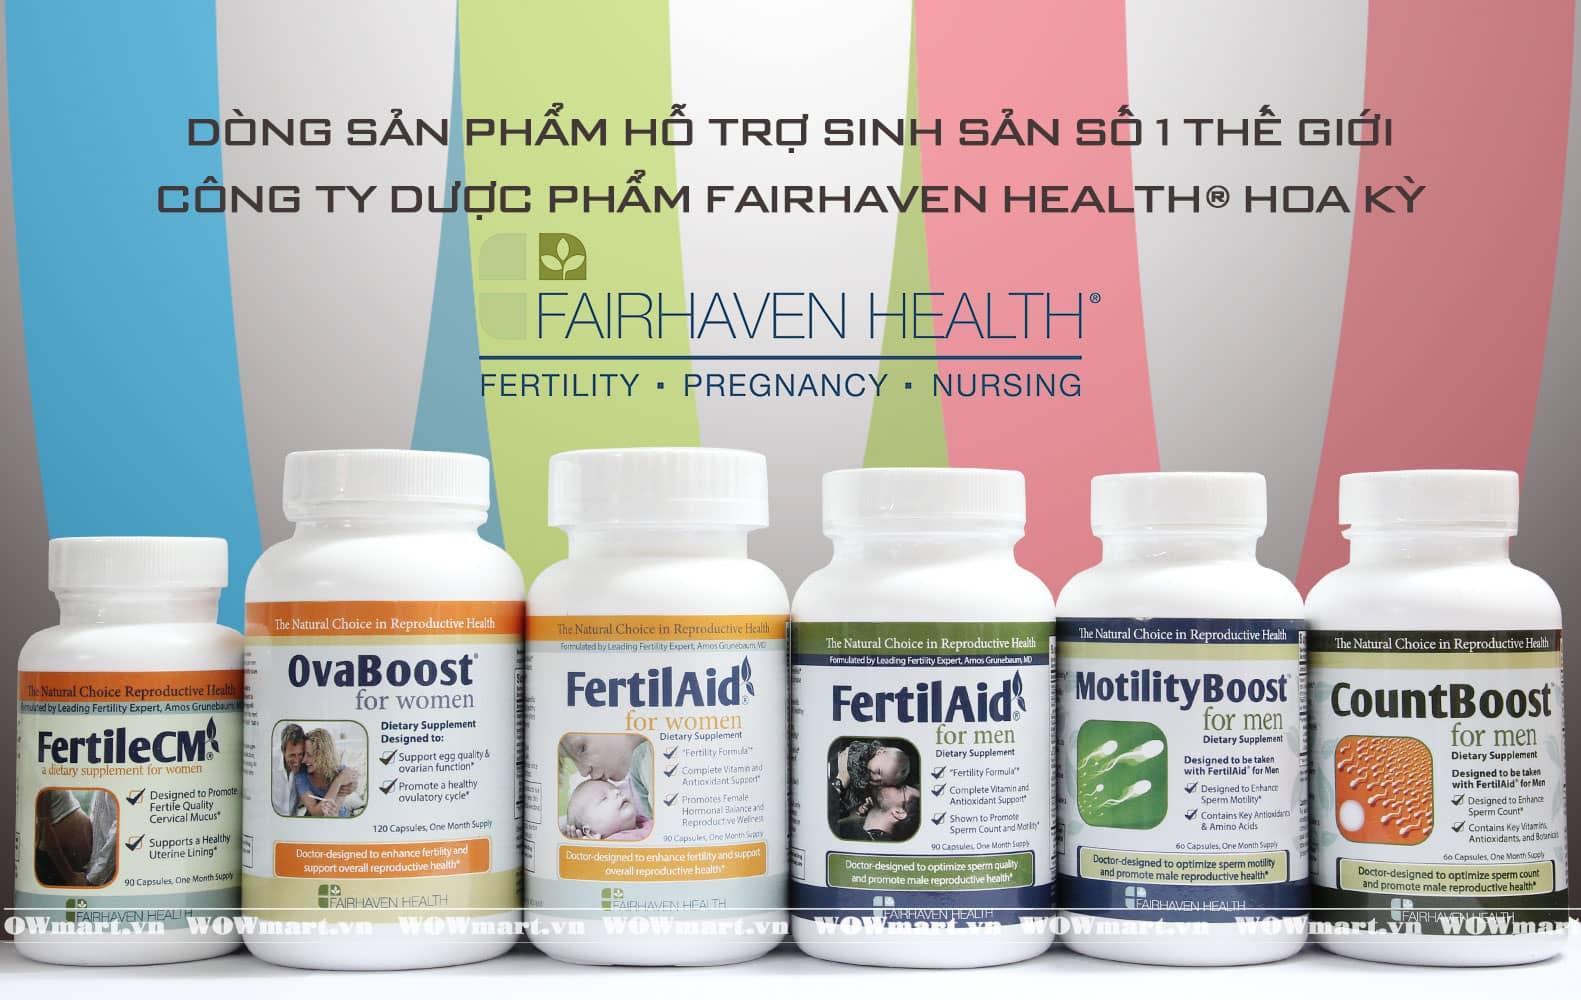 dong-san-pham-fairhaven-health-